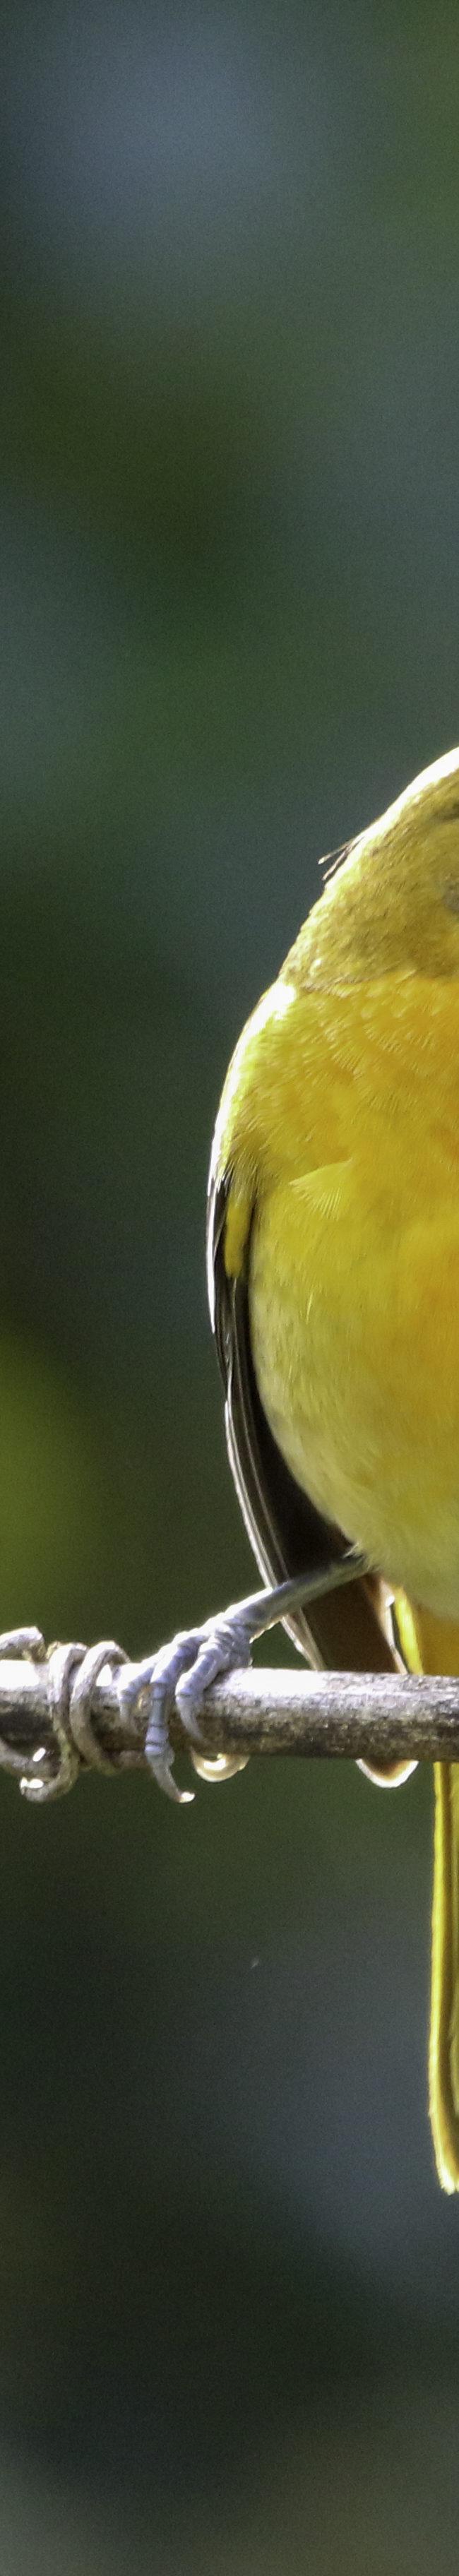 Baltimoretroepiaal / Baltimore Oriole (Icterus galbula) juveniel